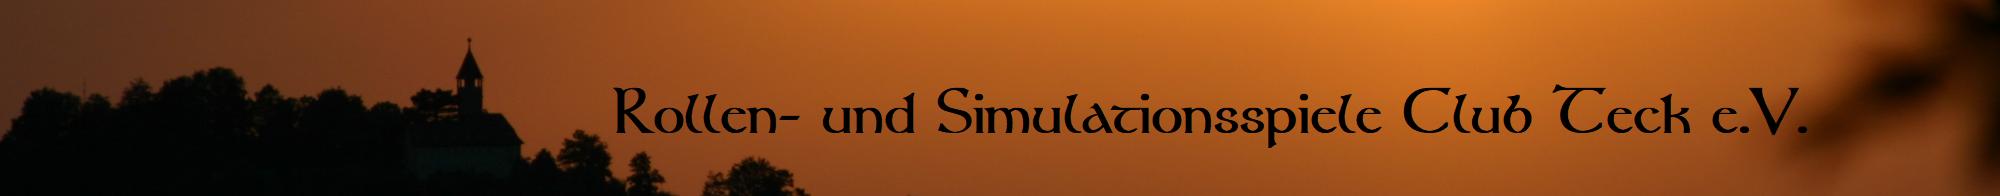 Rollen- und Simulationsspiele Club Teck e.V.